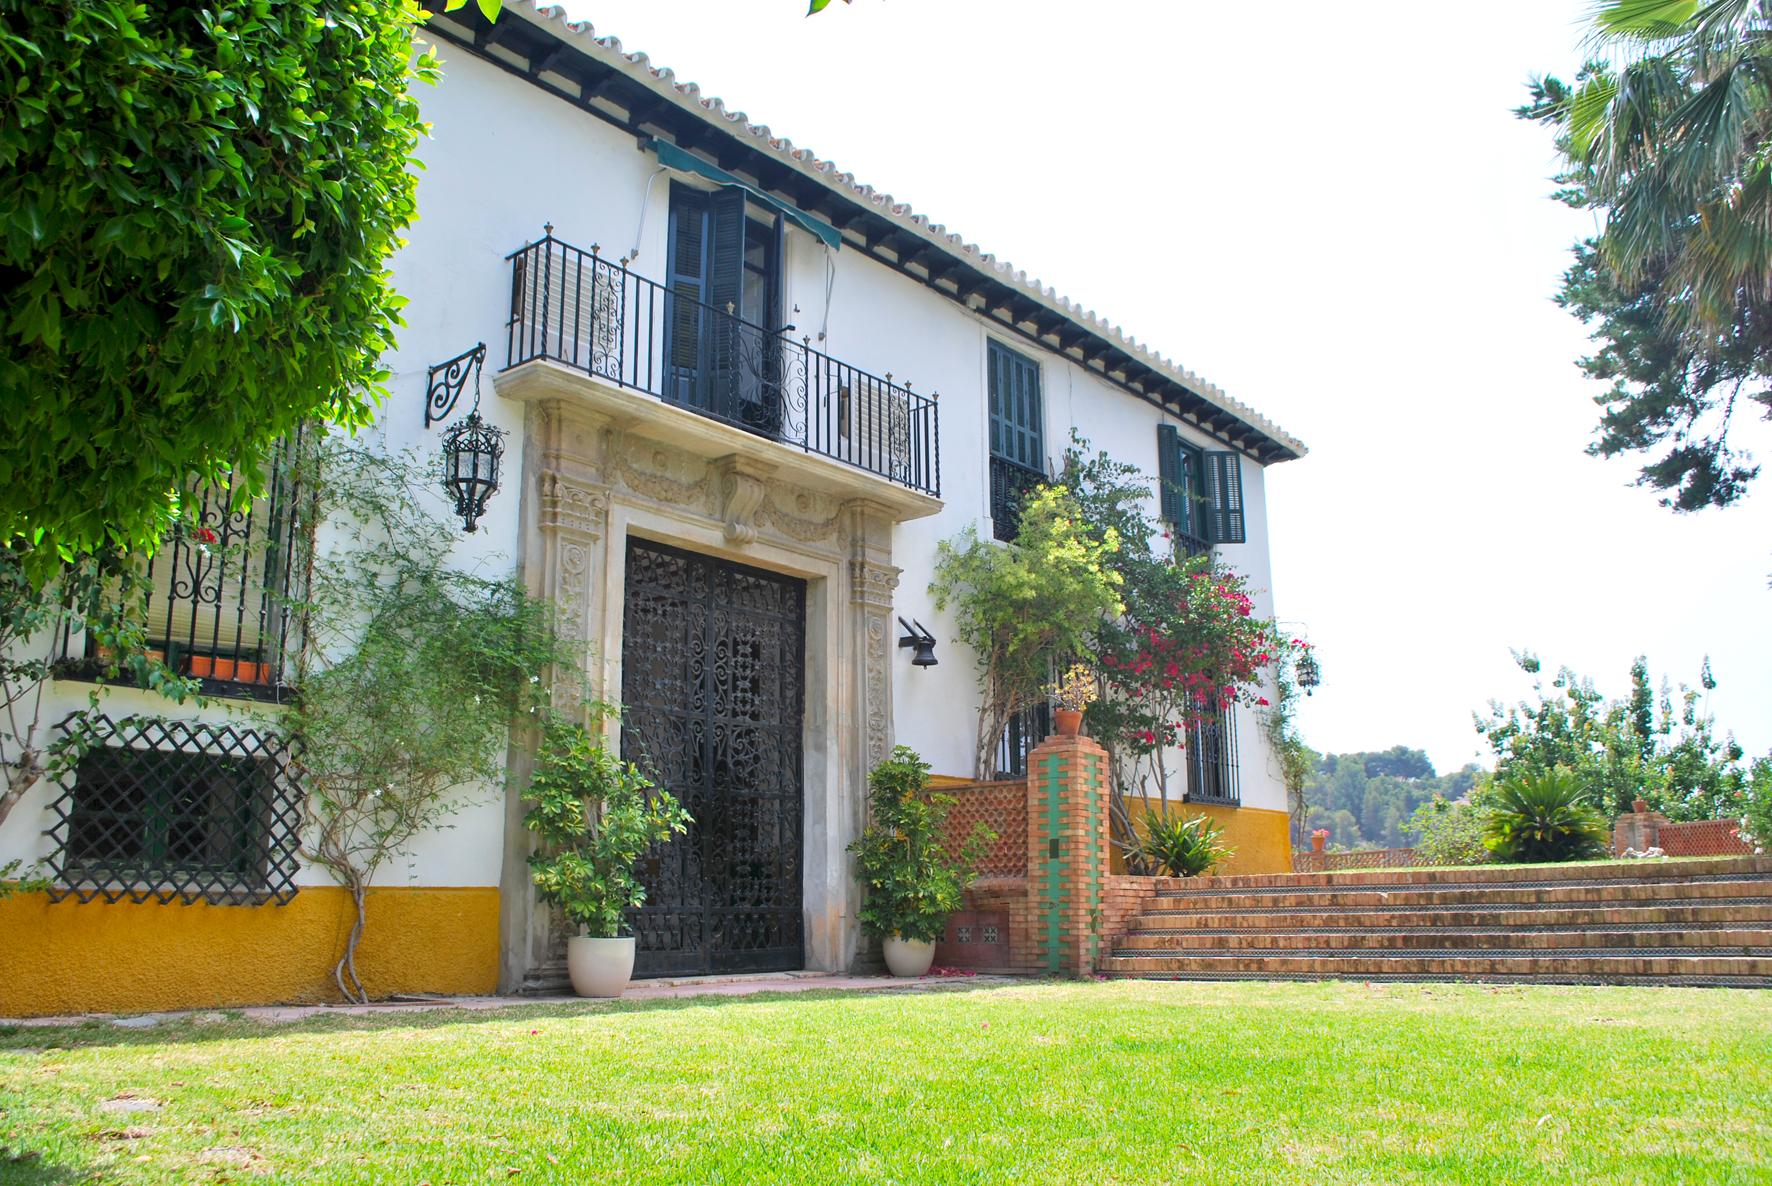 The front of Hacienda Clavero